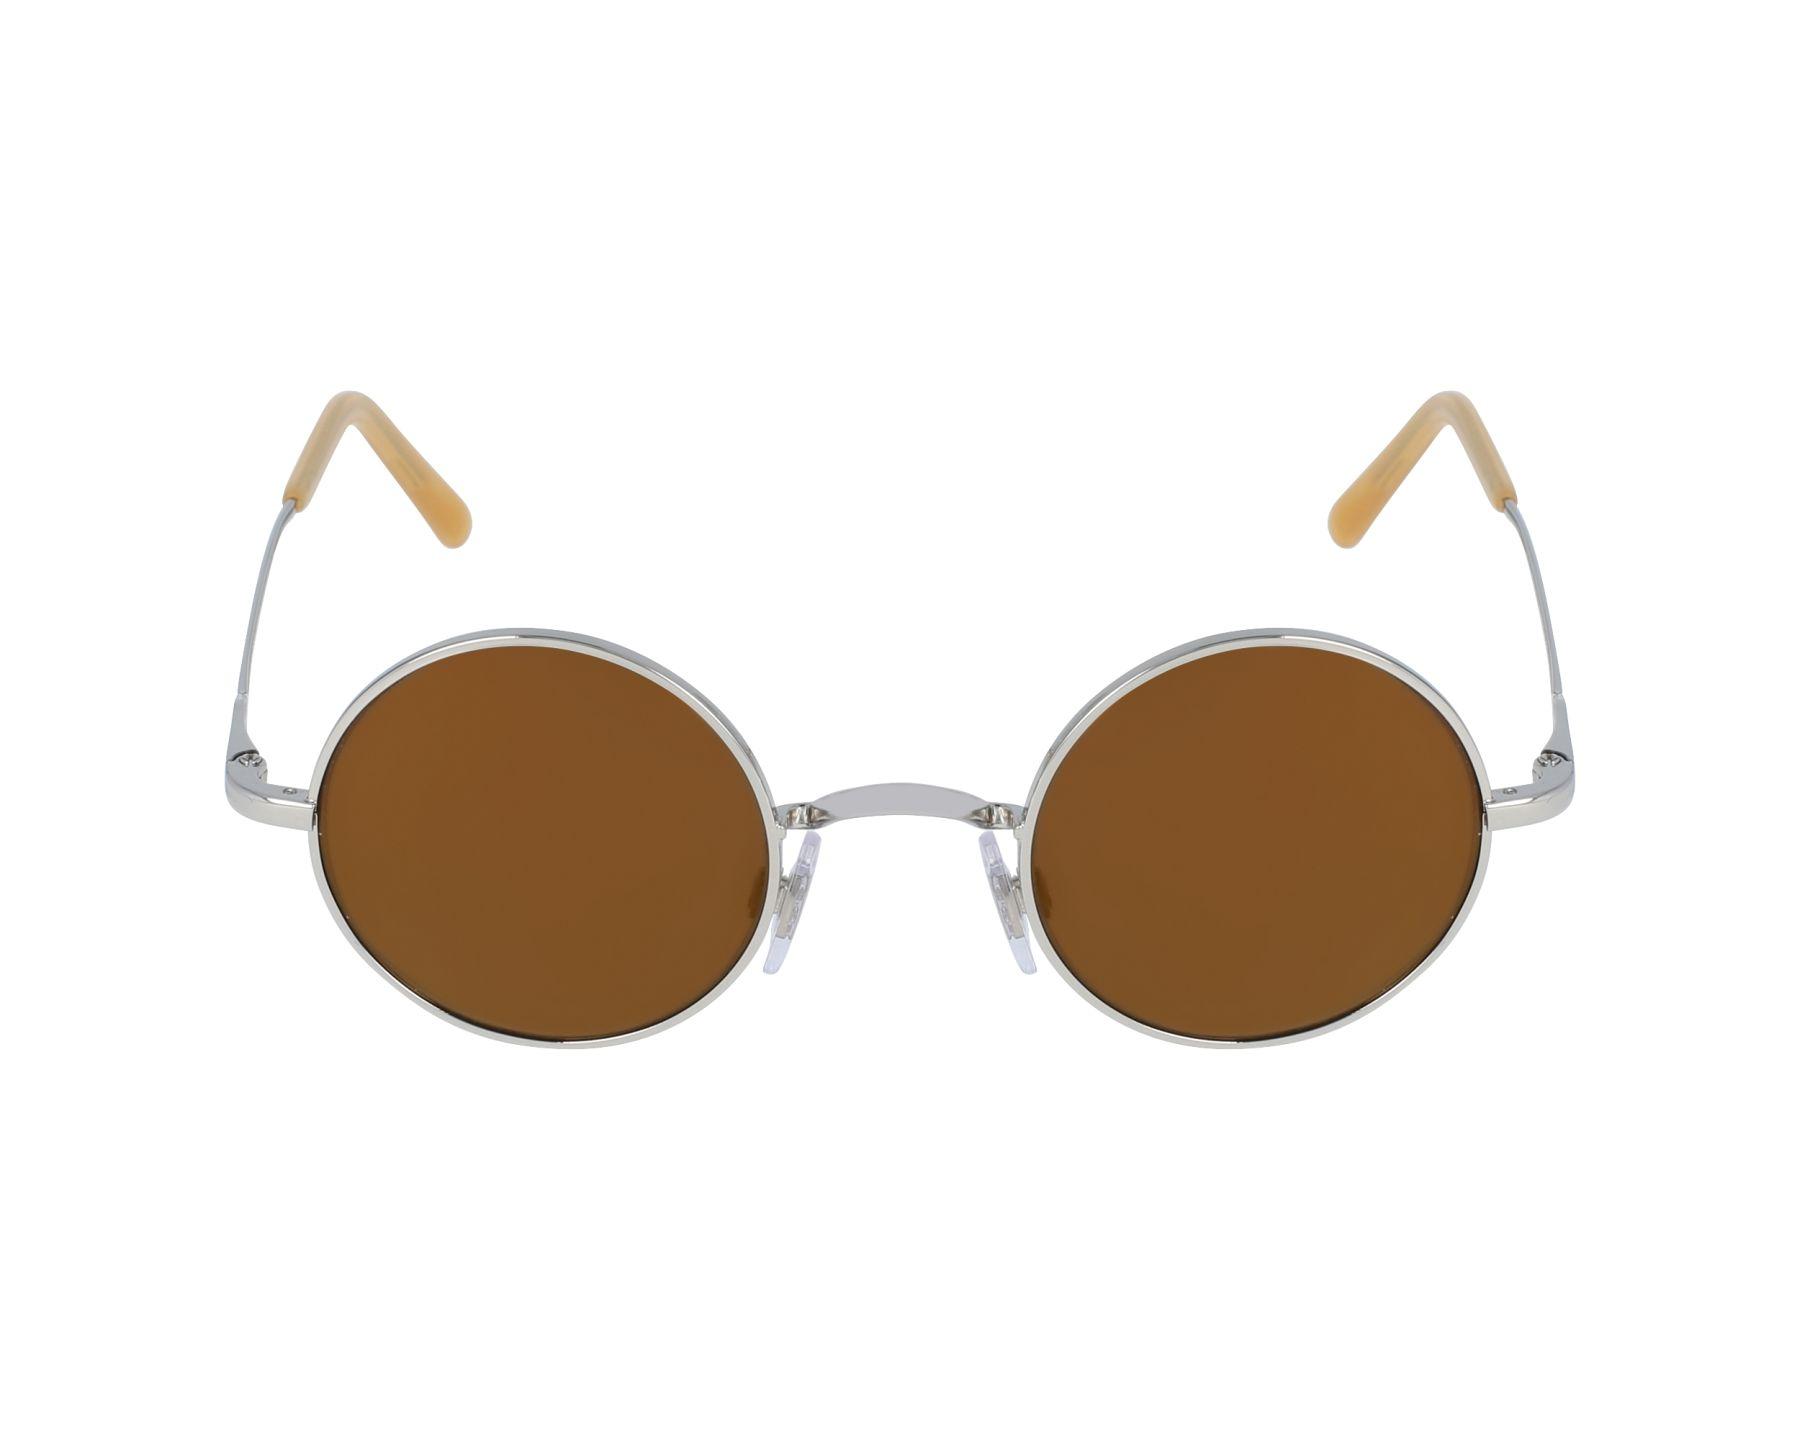 Dolce & Gabbana Sonnenbrille (DG2168 05/F9 42) f3cL8PxCgE